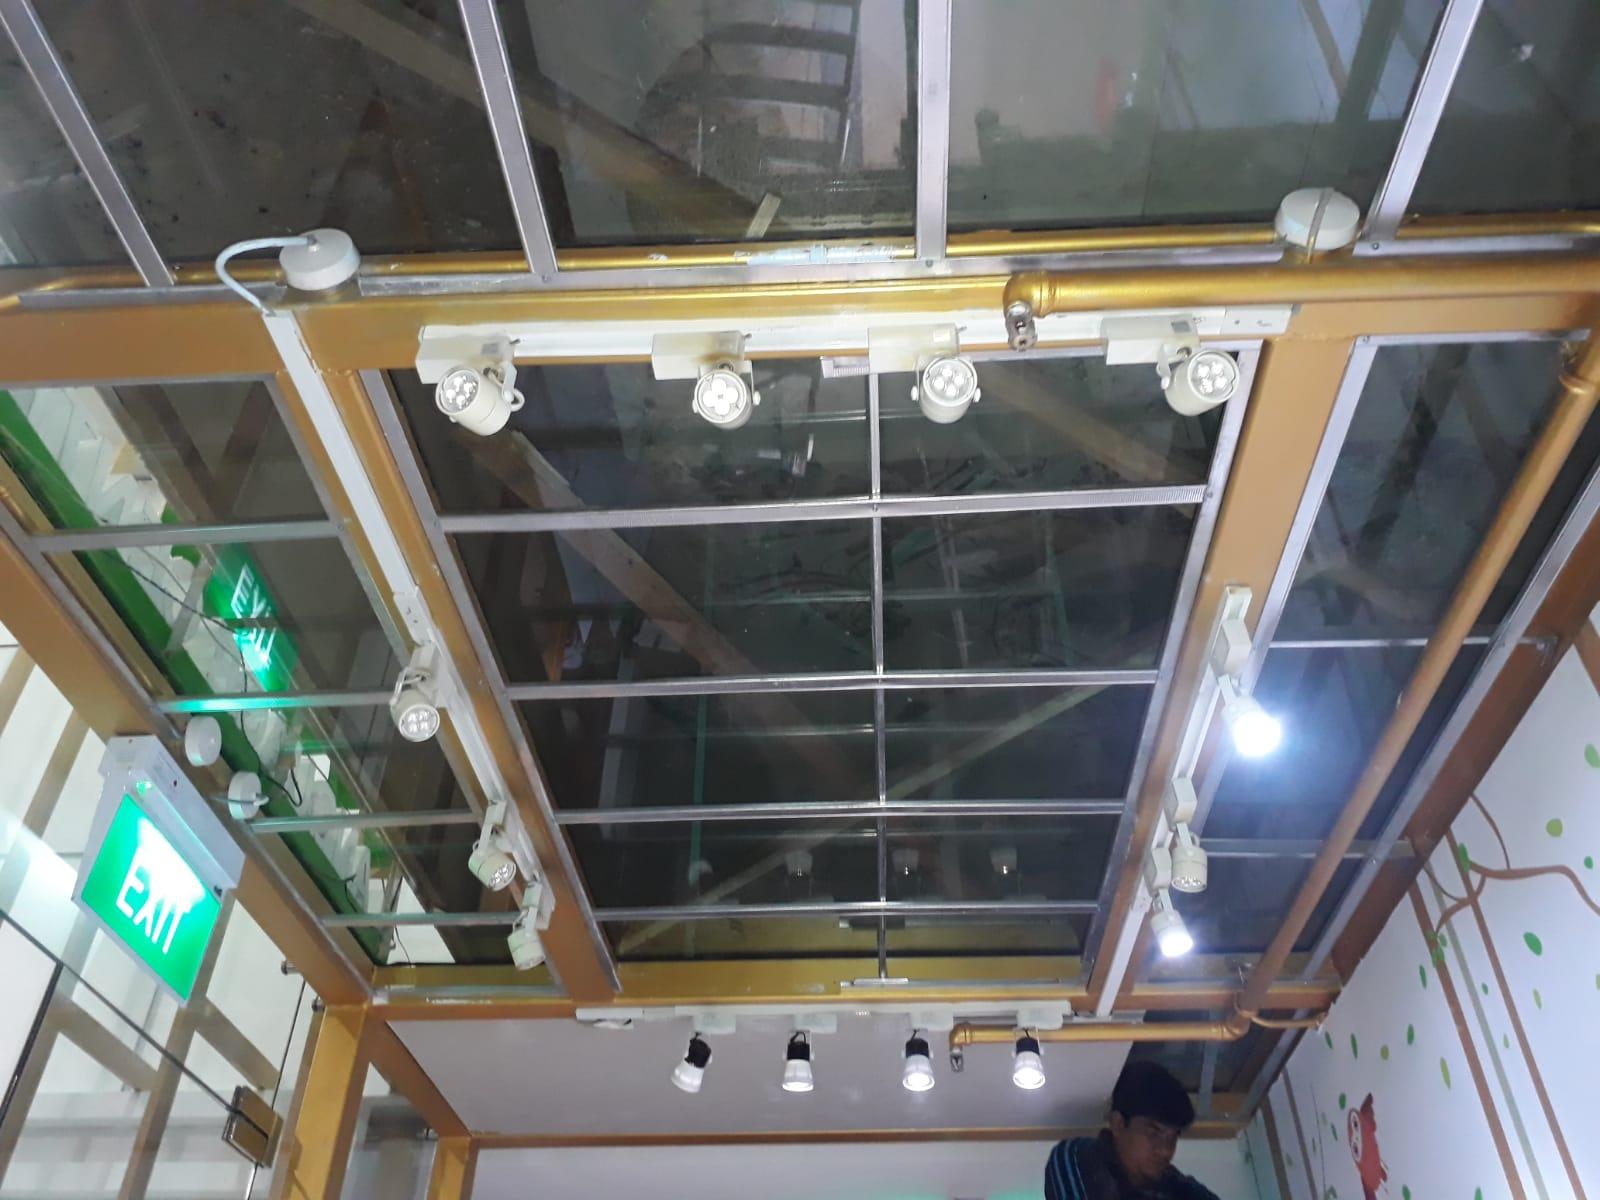 false-ceiling-installation-vm-ceiling-commercial-woodlands-singapore-6